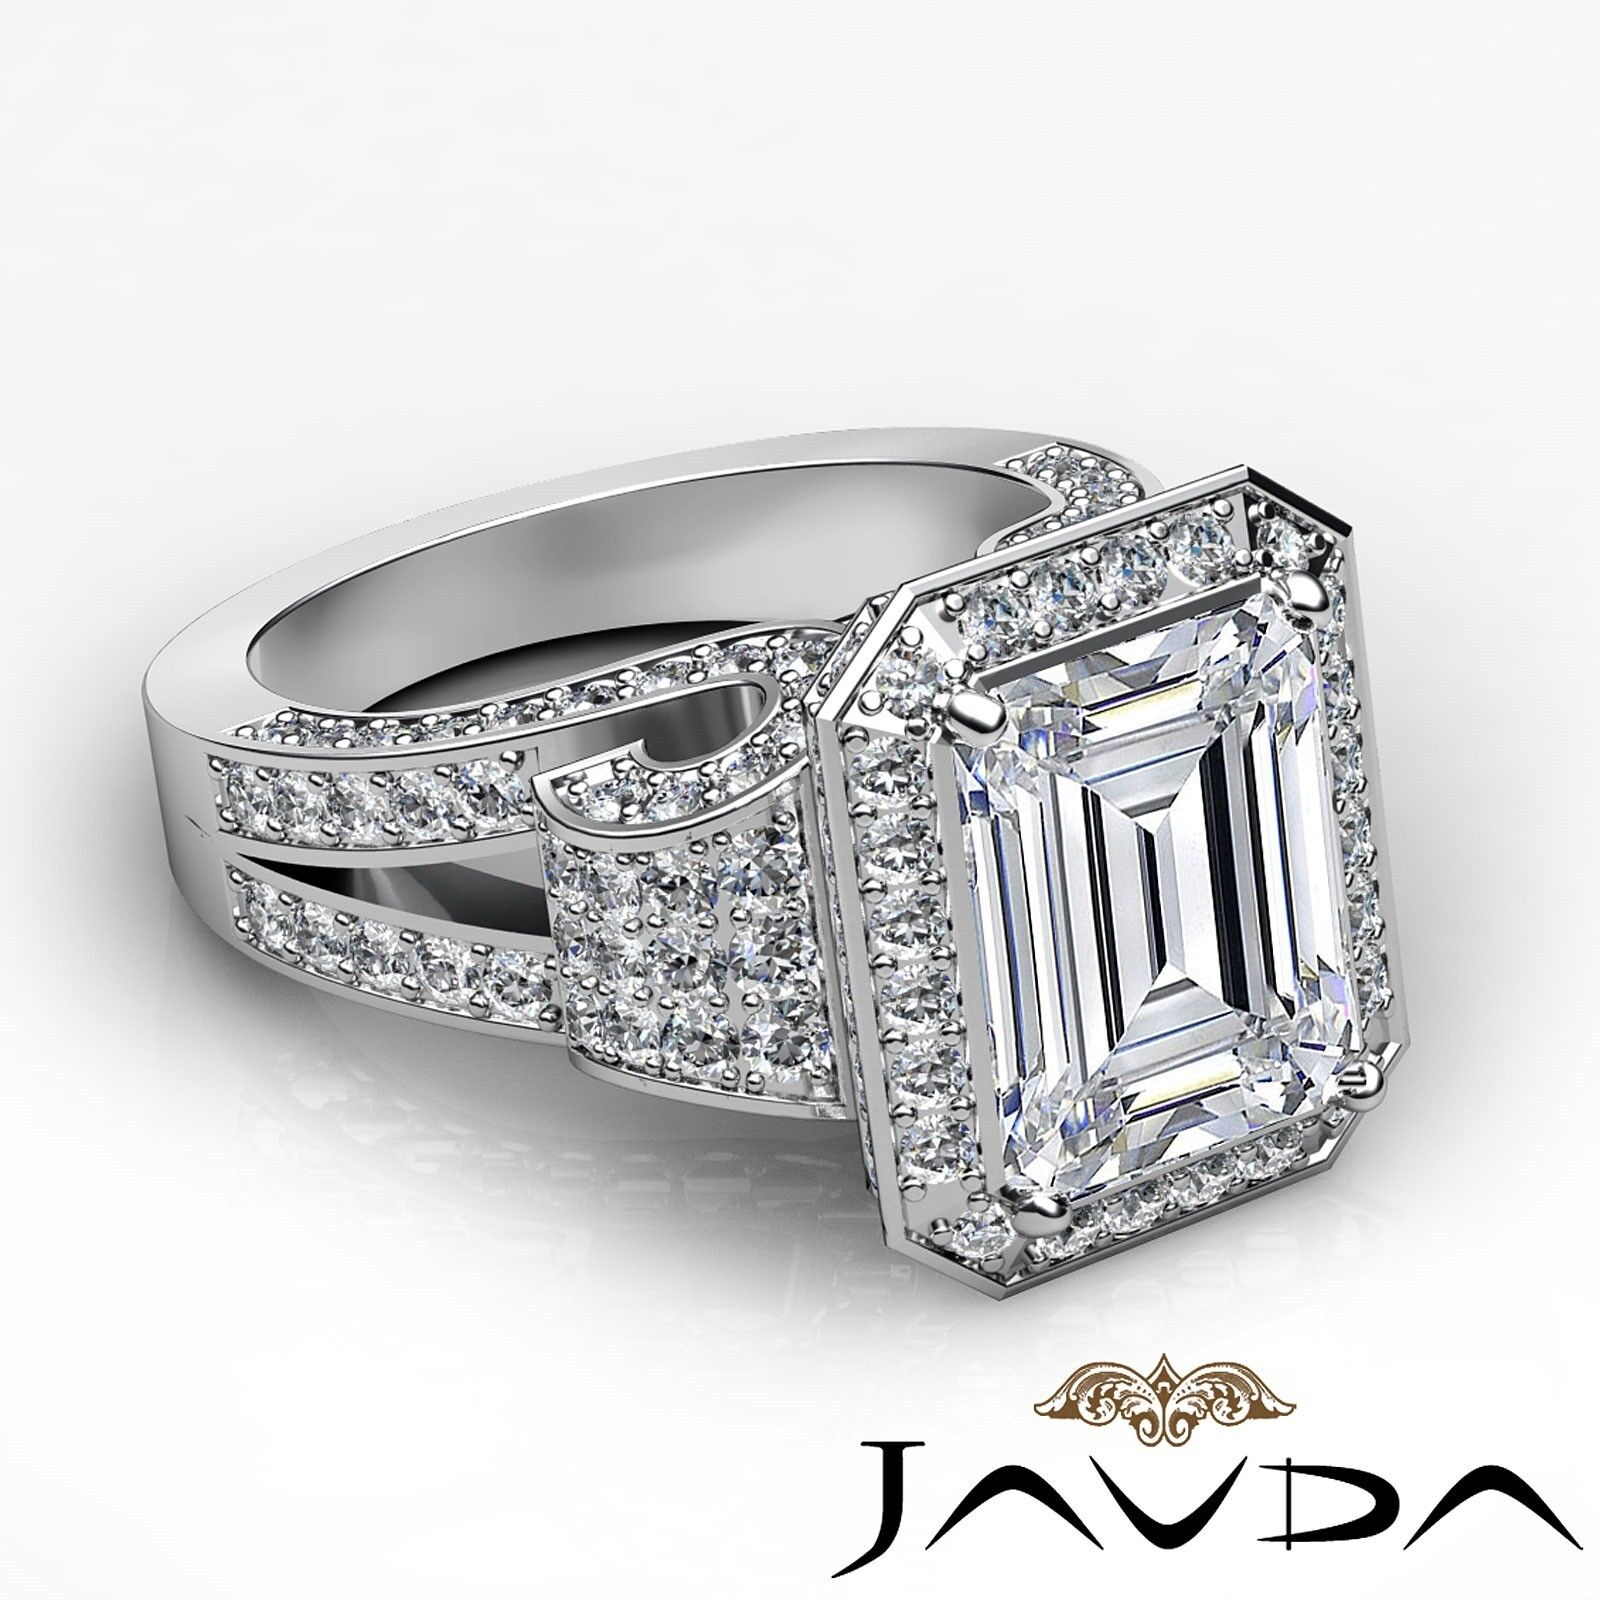 4.4ctw Antique Vintage Halo Emerald Diamond Engagement Ring GIA I-VS1 White Gold 2